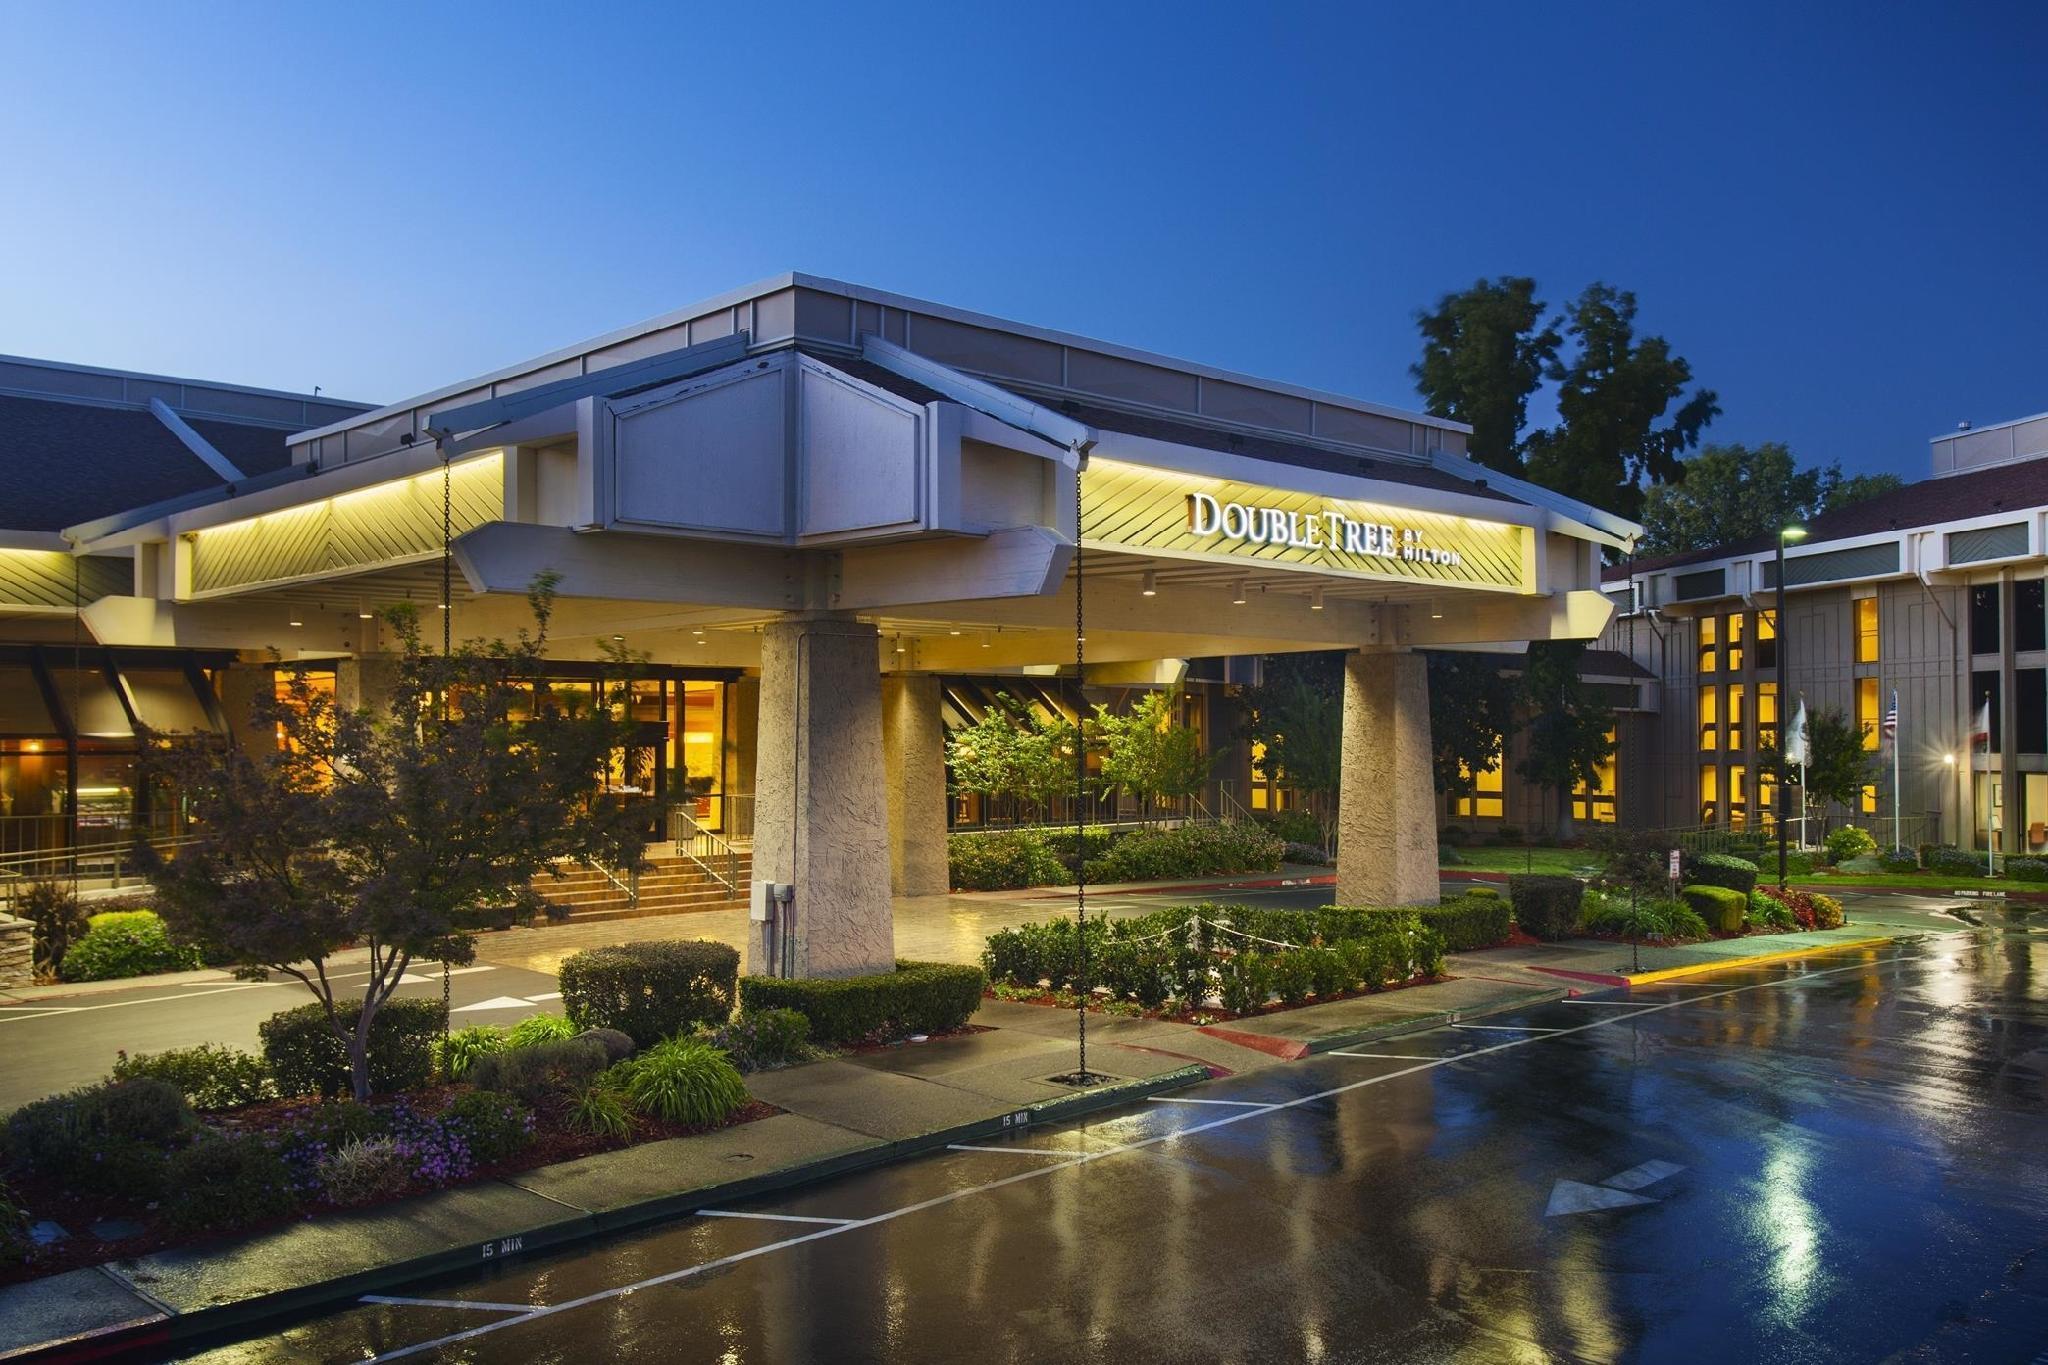 Doubletree By Hilton Sacramento Hotel